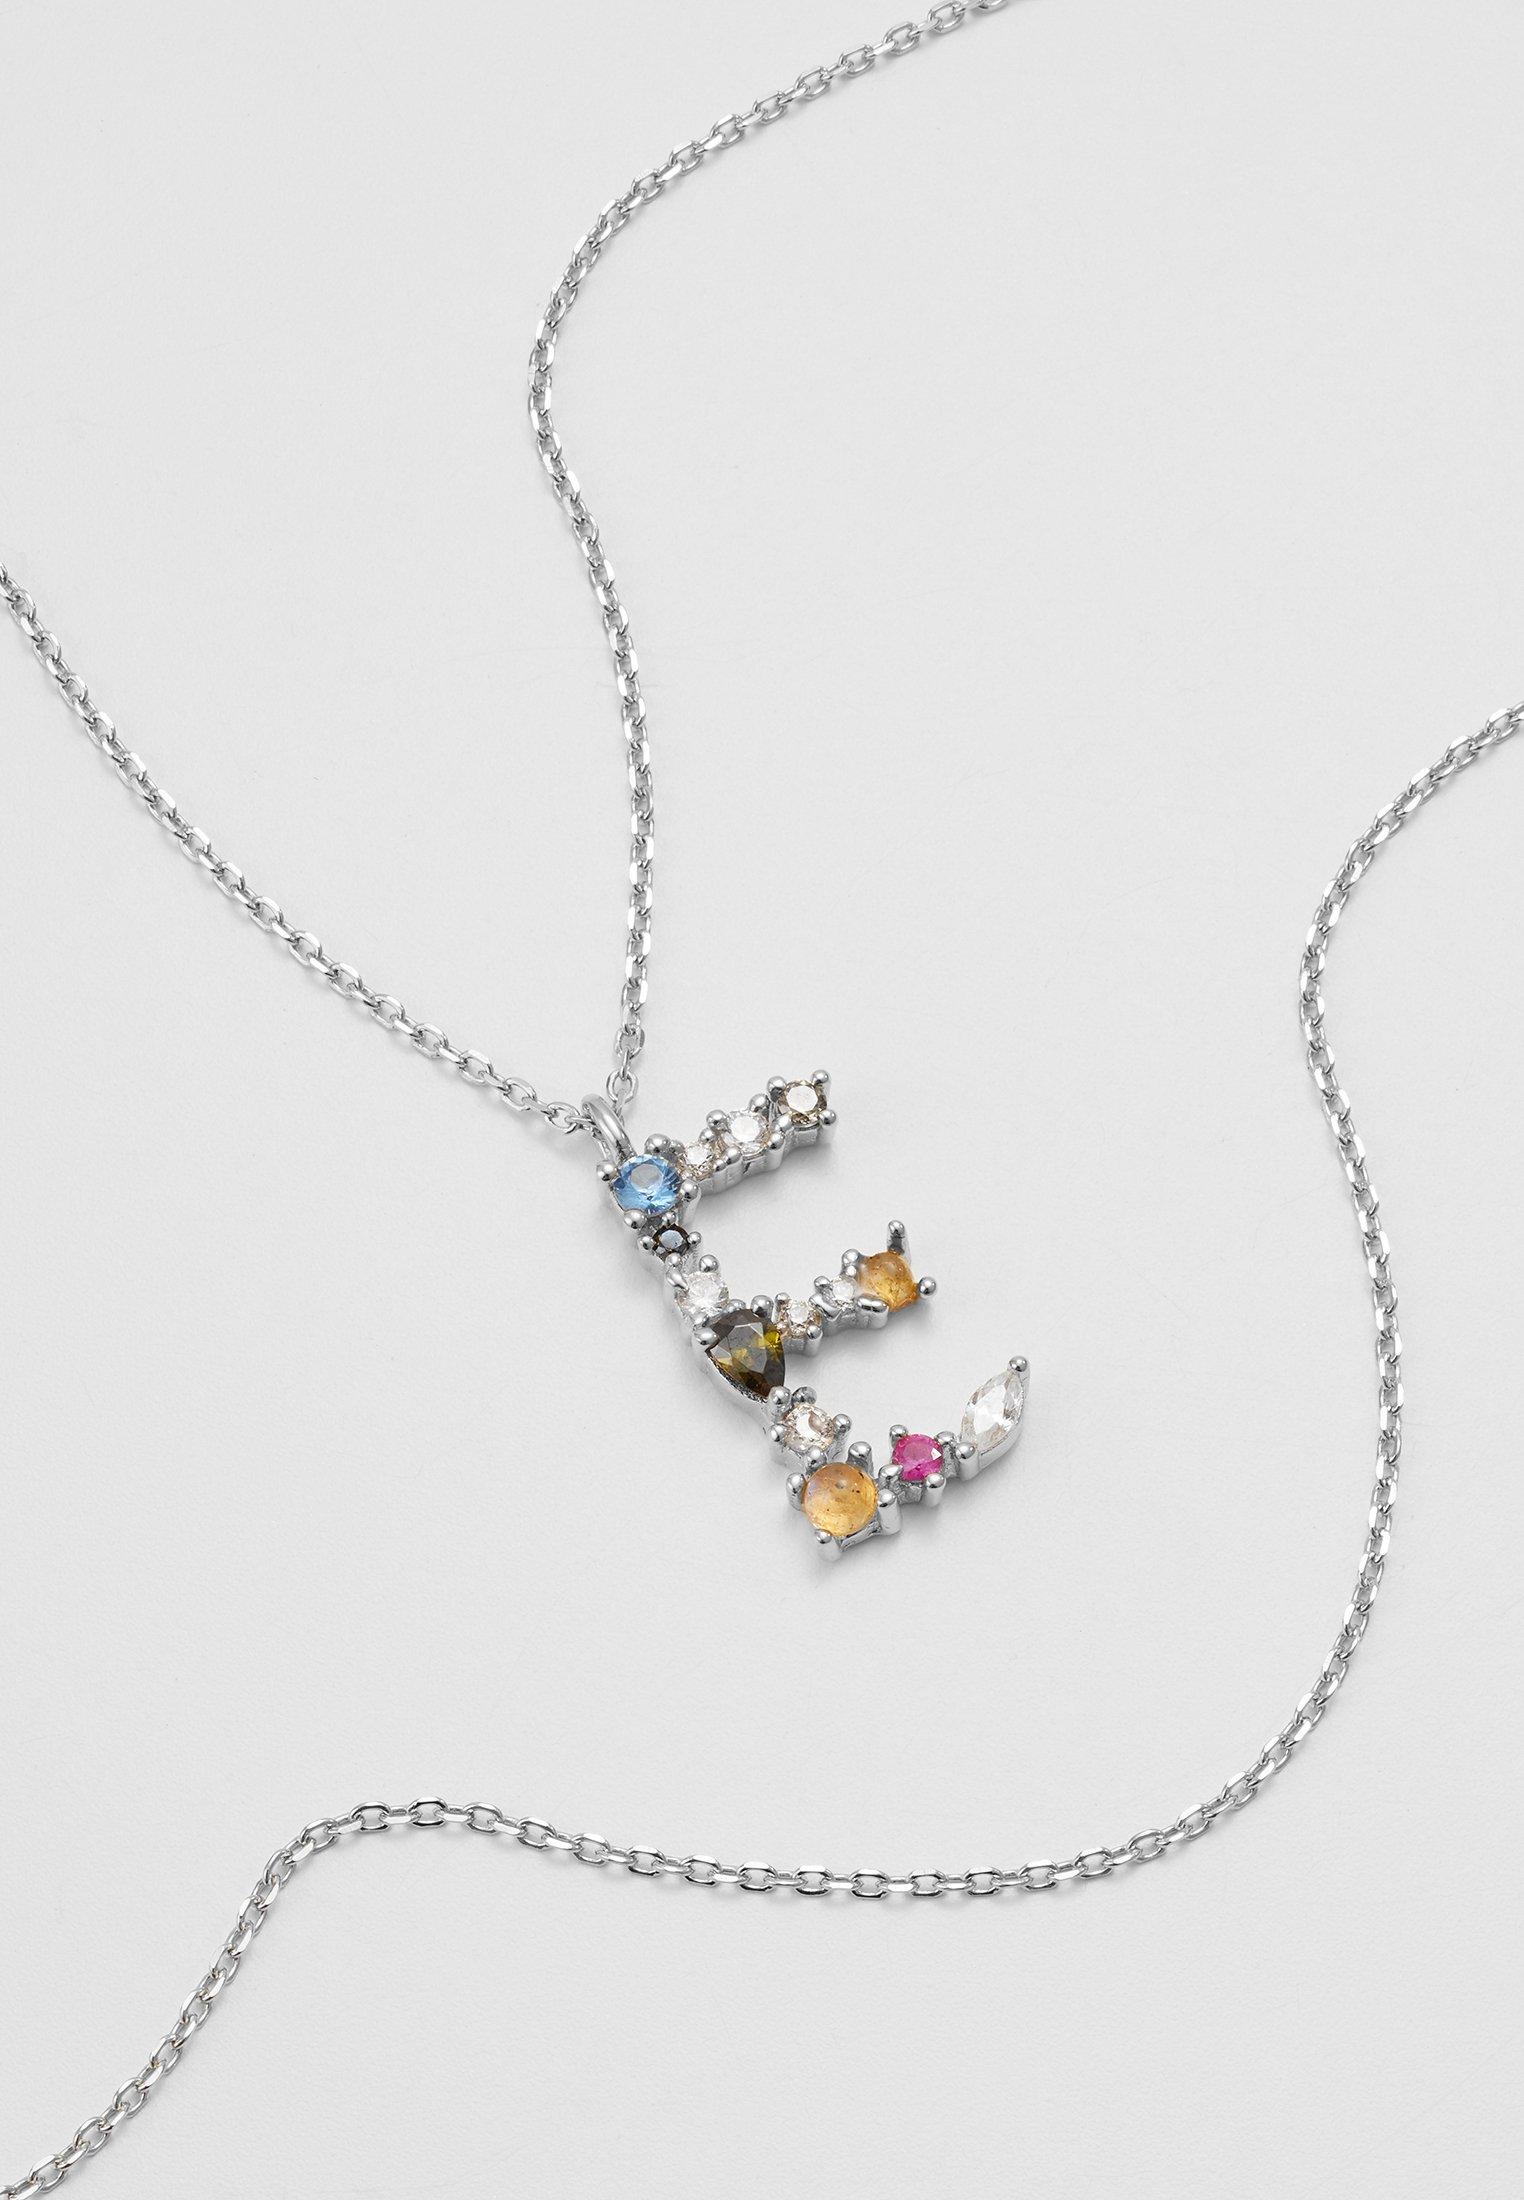 Cool Get Accessories P D Paola LETTER NECKLACE Necklace silver js9vmHRsl 3EHoqAMgZ